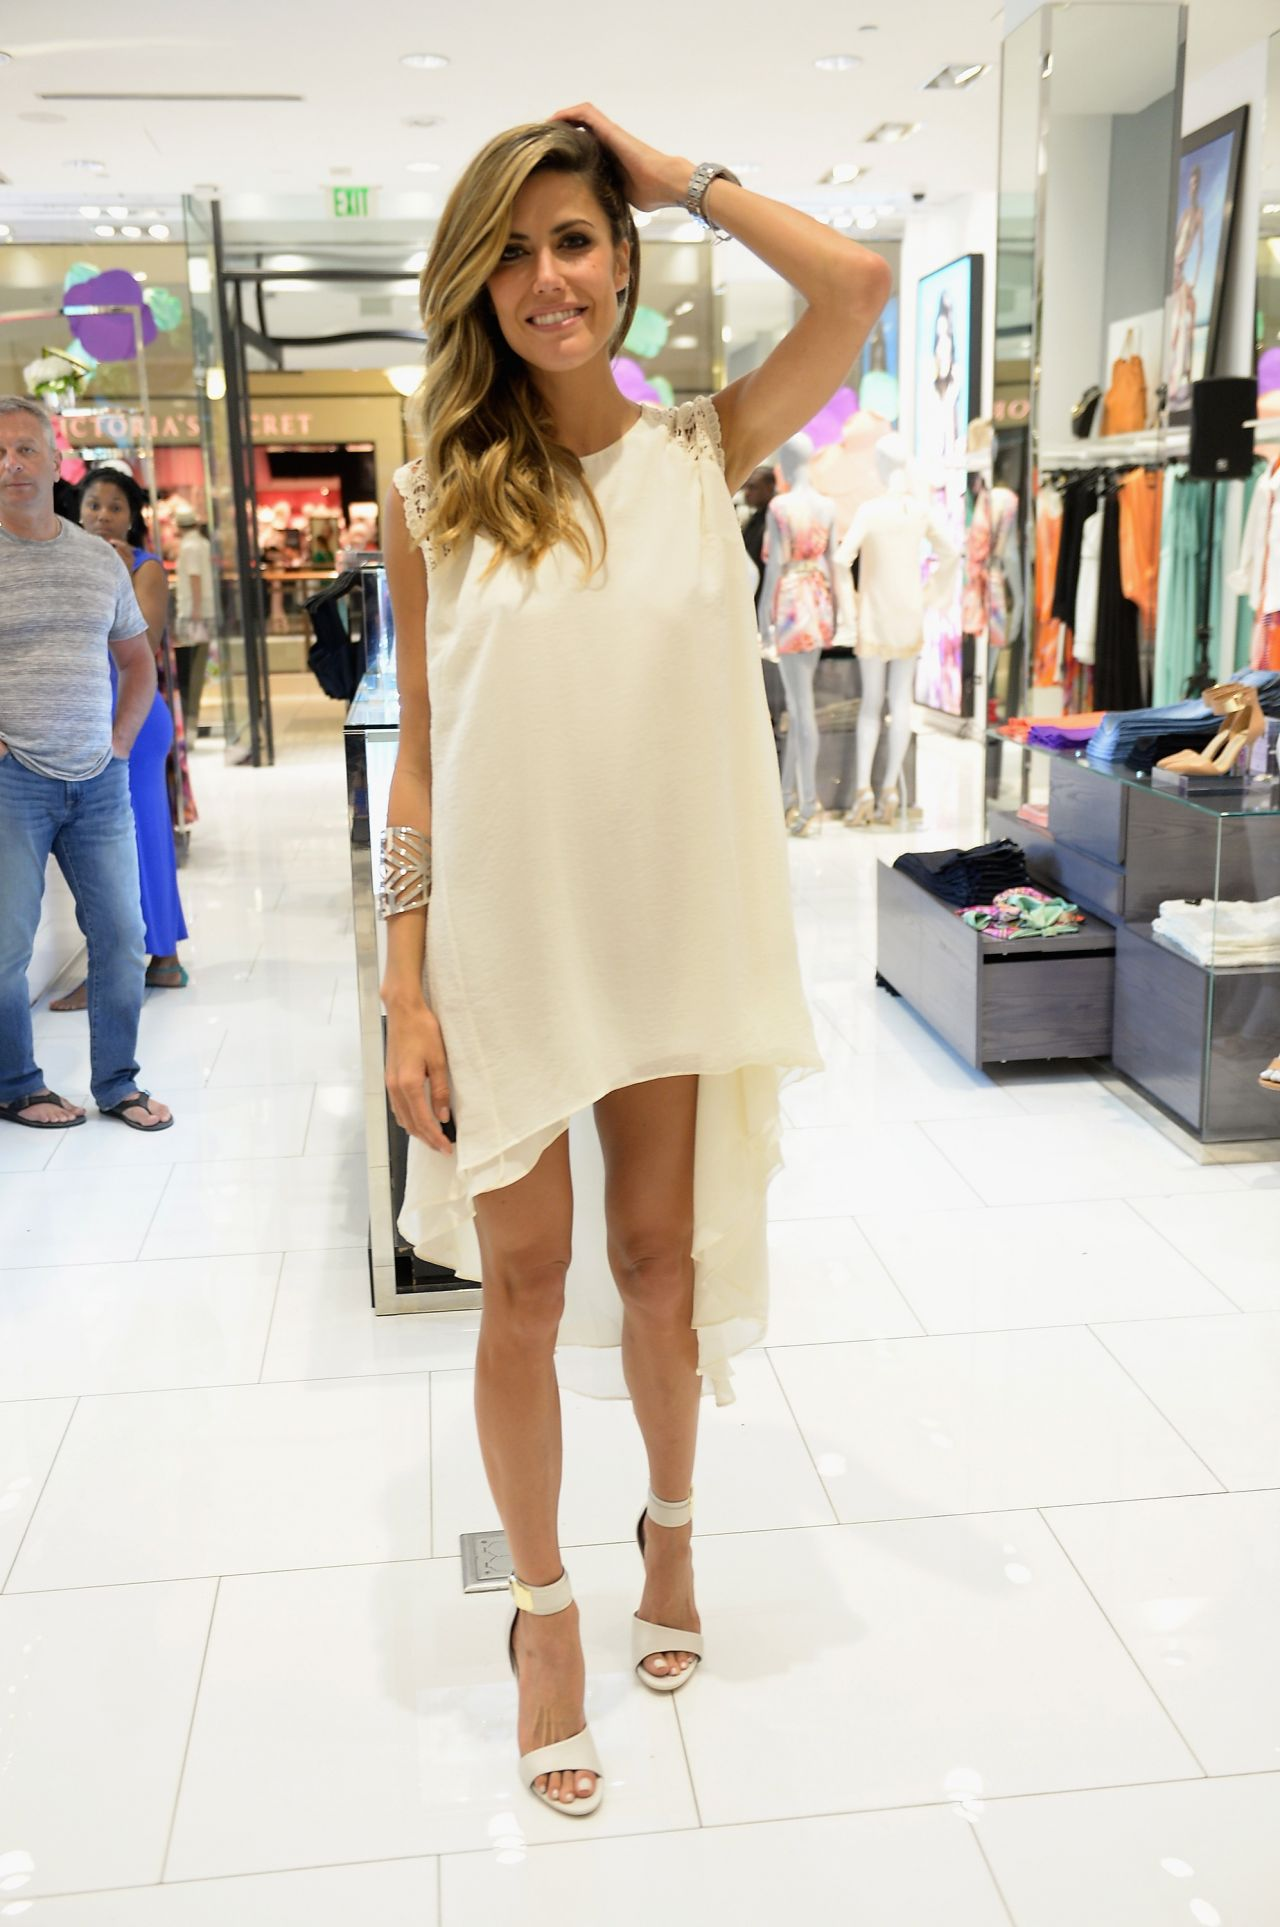 Martha Graeff - Marciano Aventura Celebrates Dress Month - May 2014